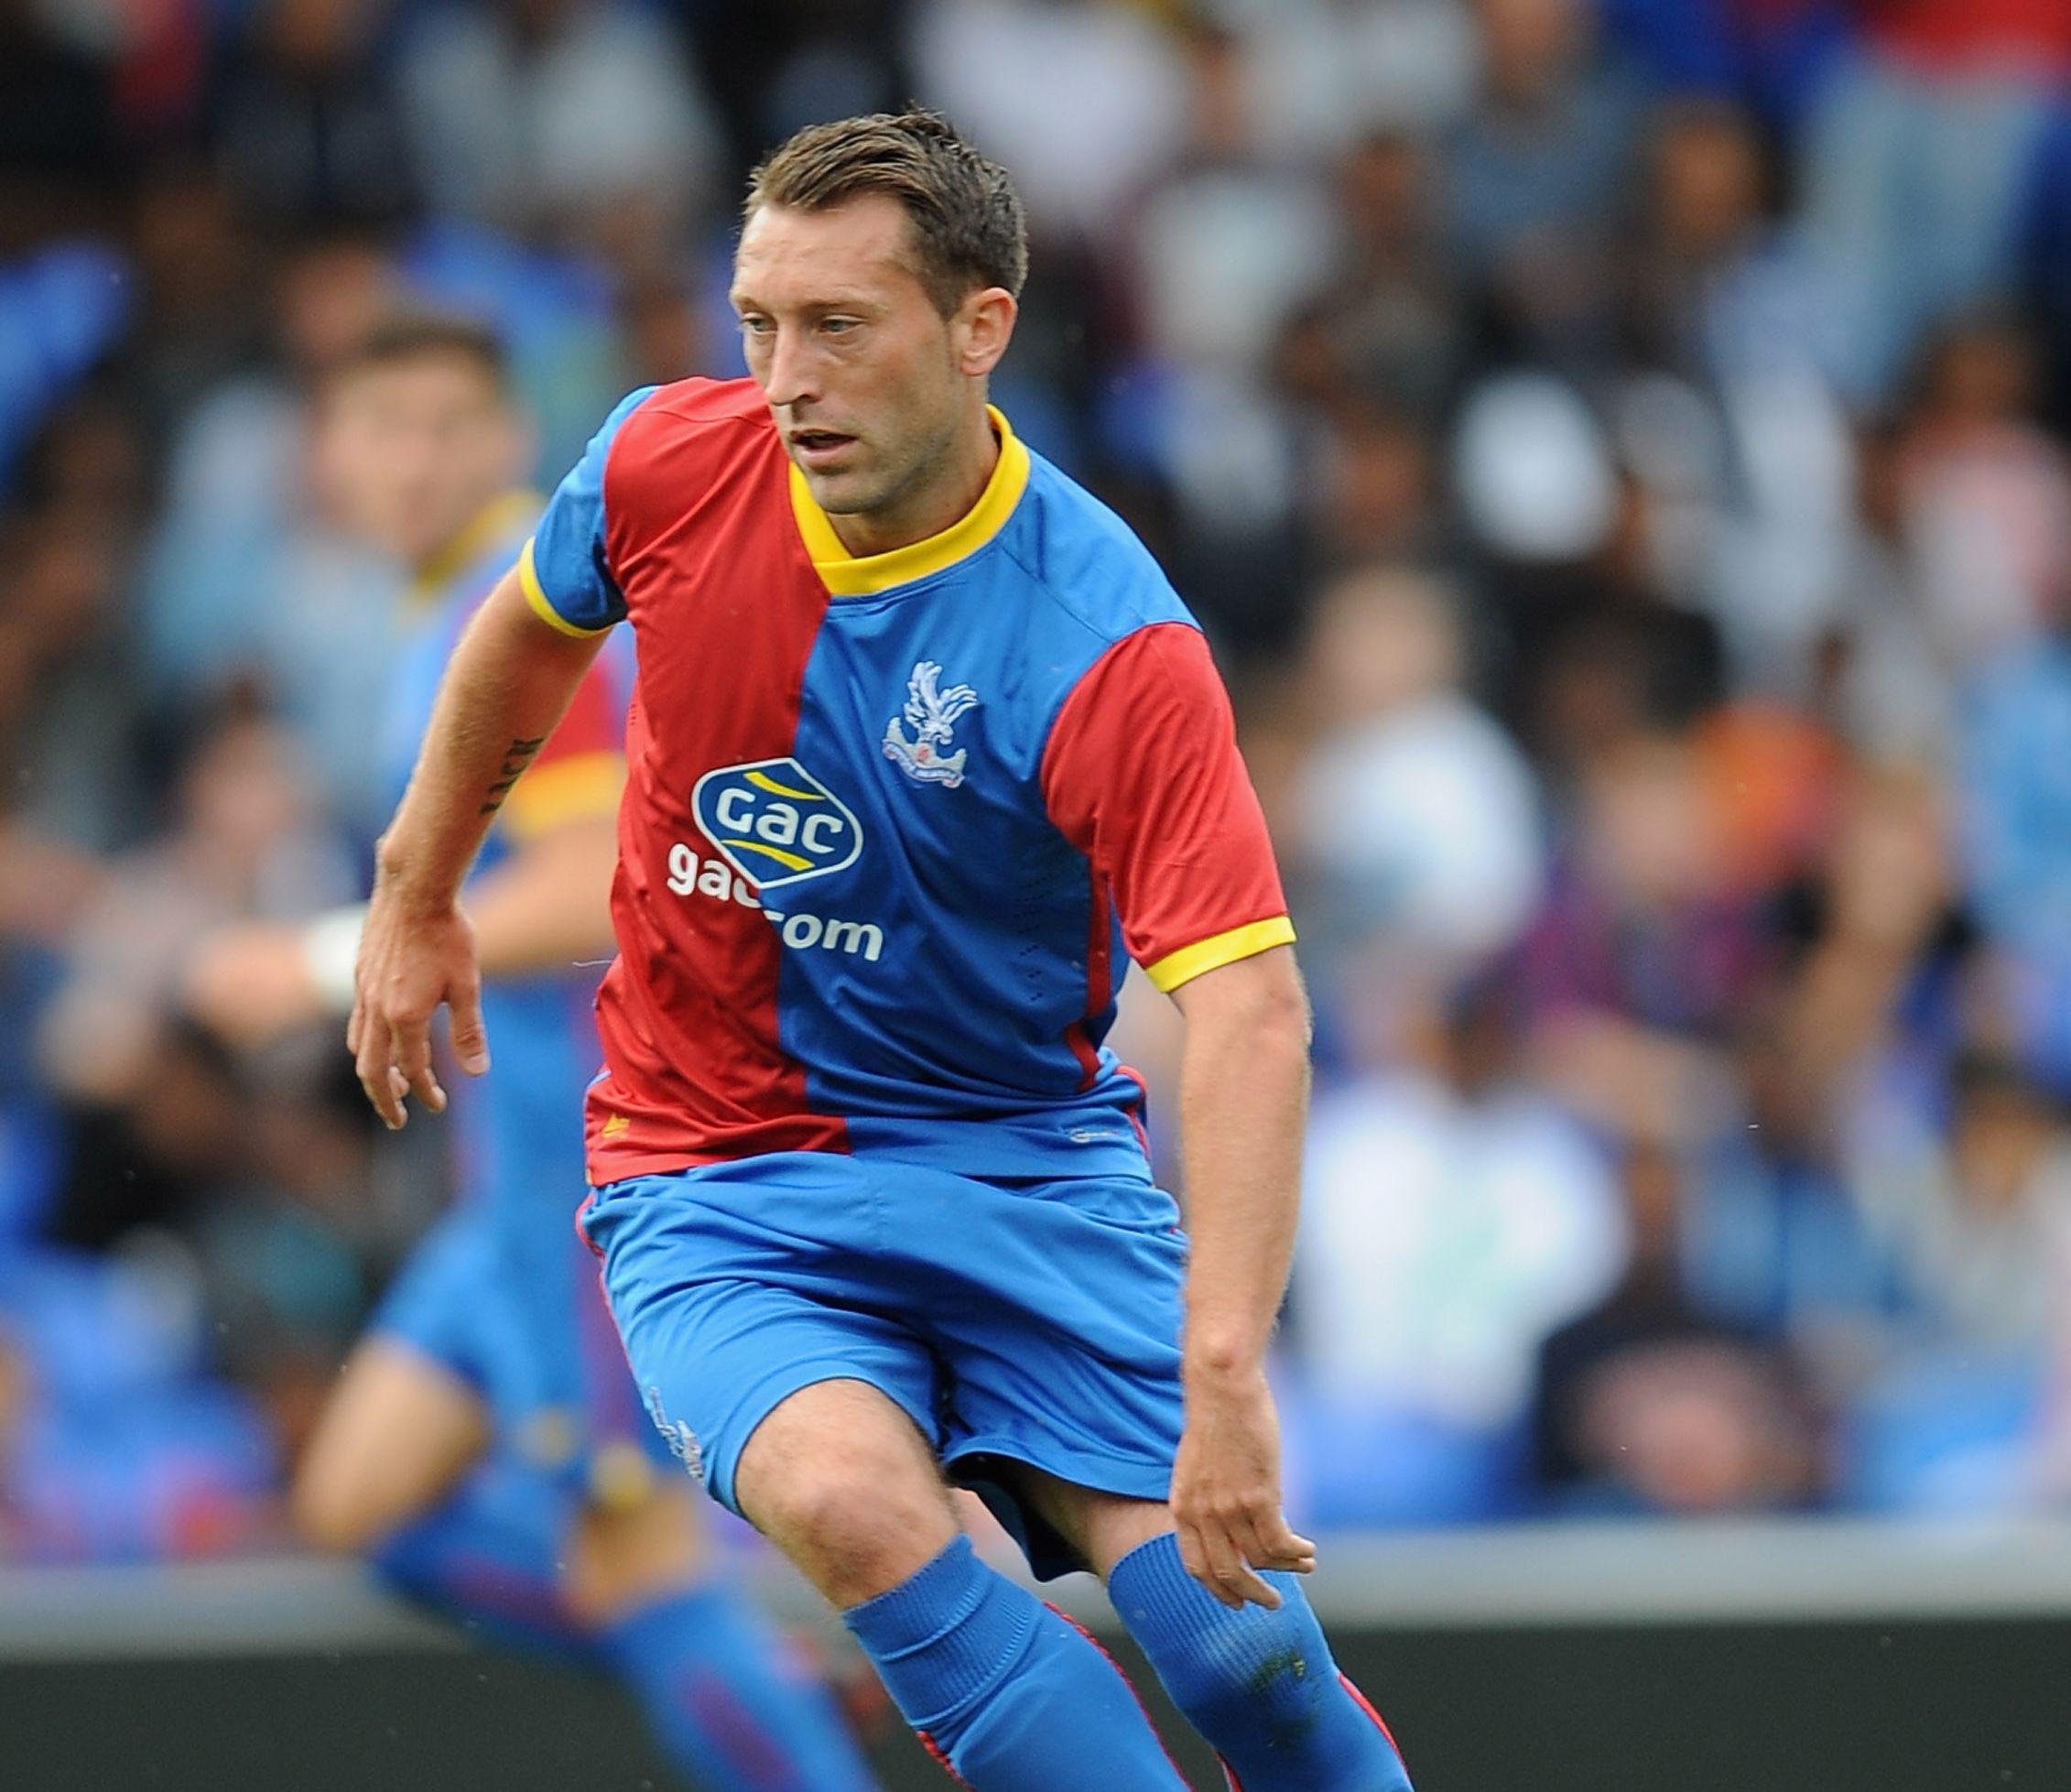 Crystal Palace forward Stephen Dobbie